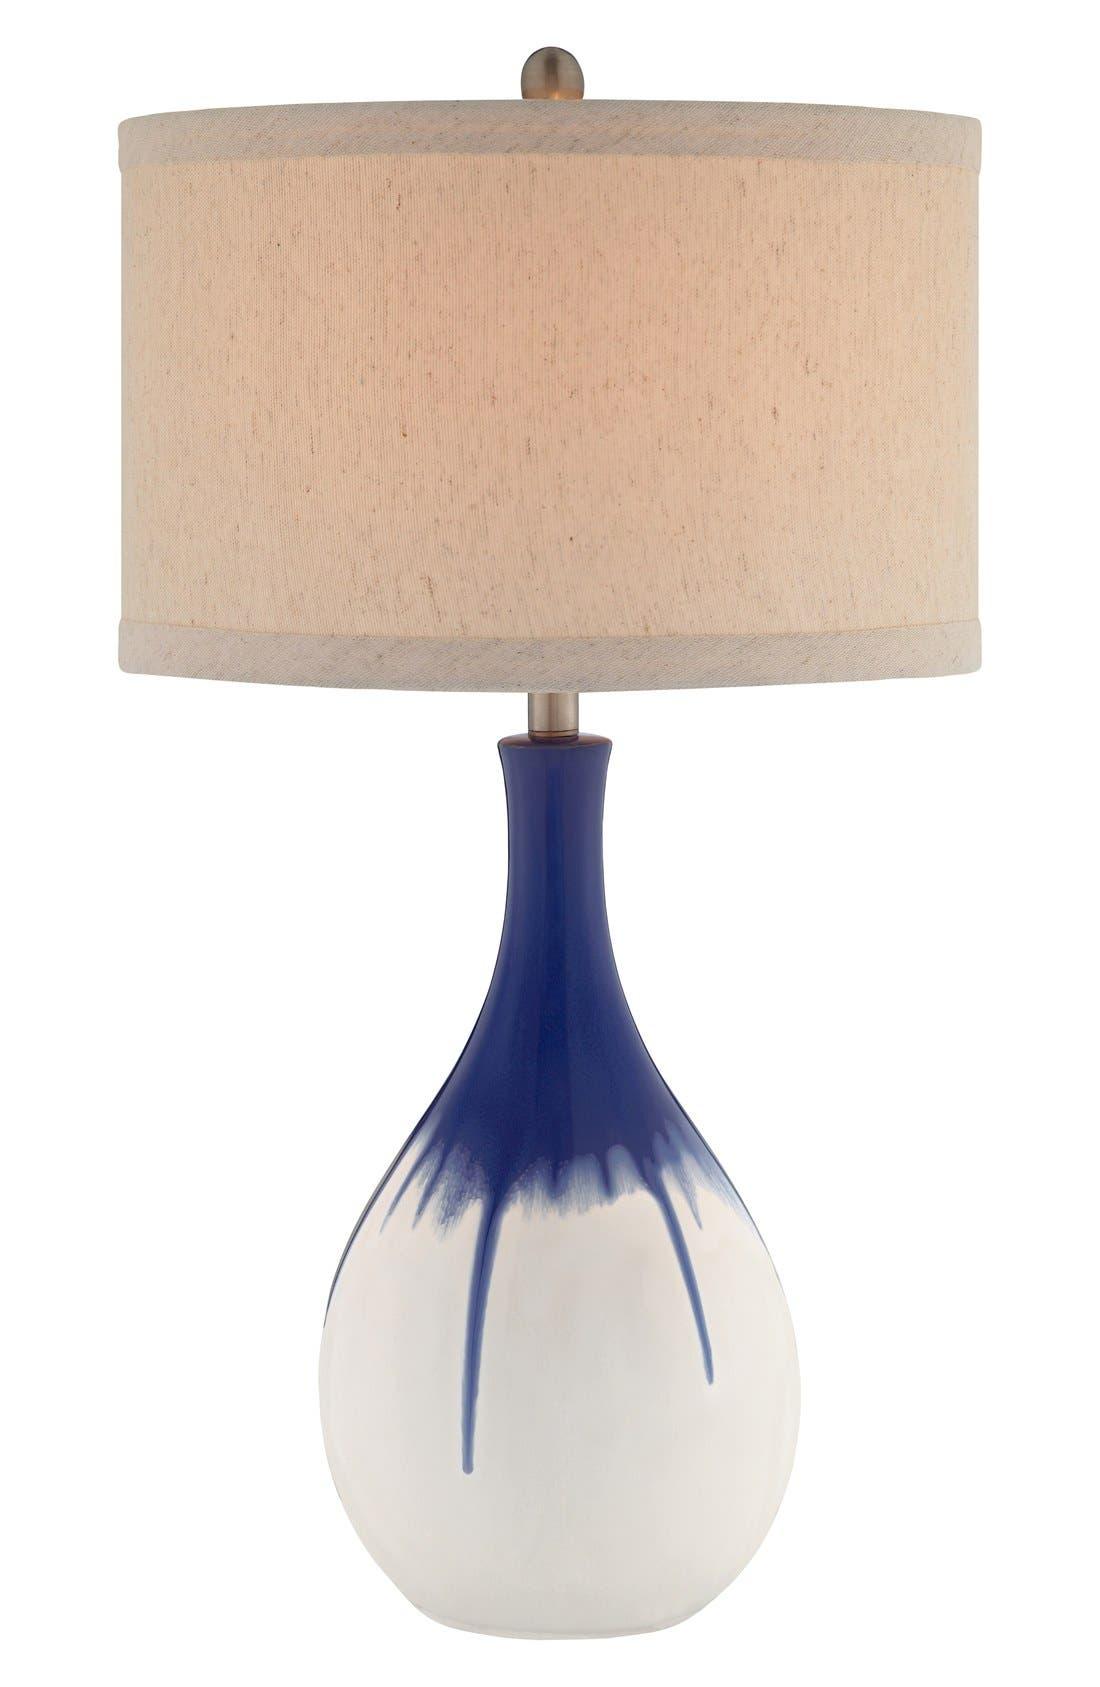 Alternate Image 1 Selected - JAlexander Lighting Cobalt Ceramic Table Lamp